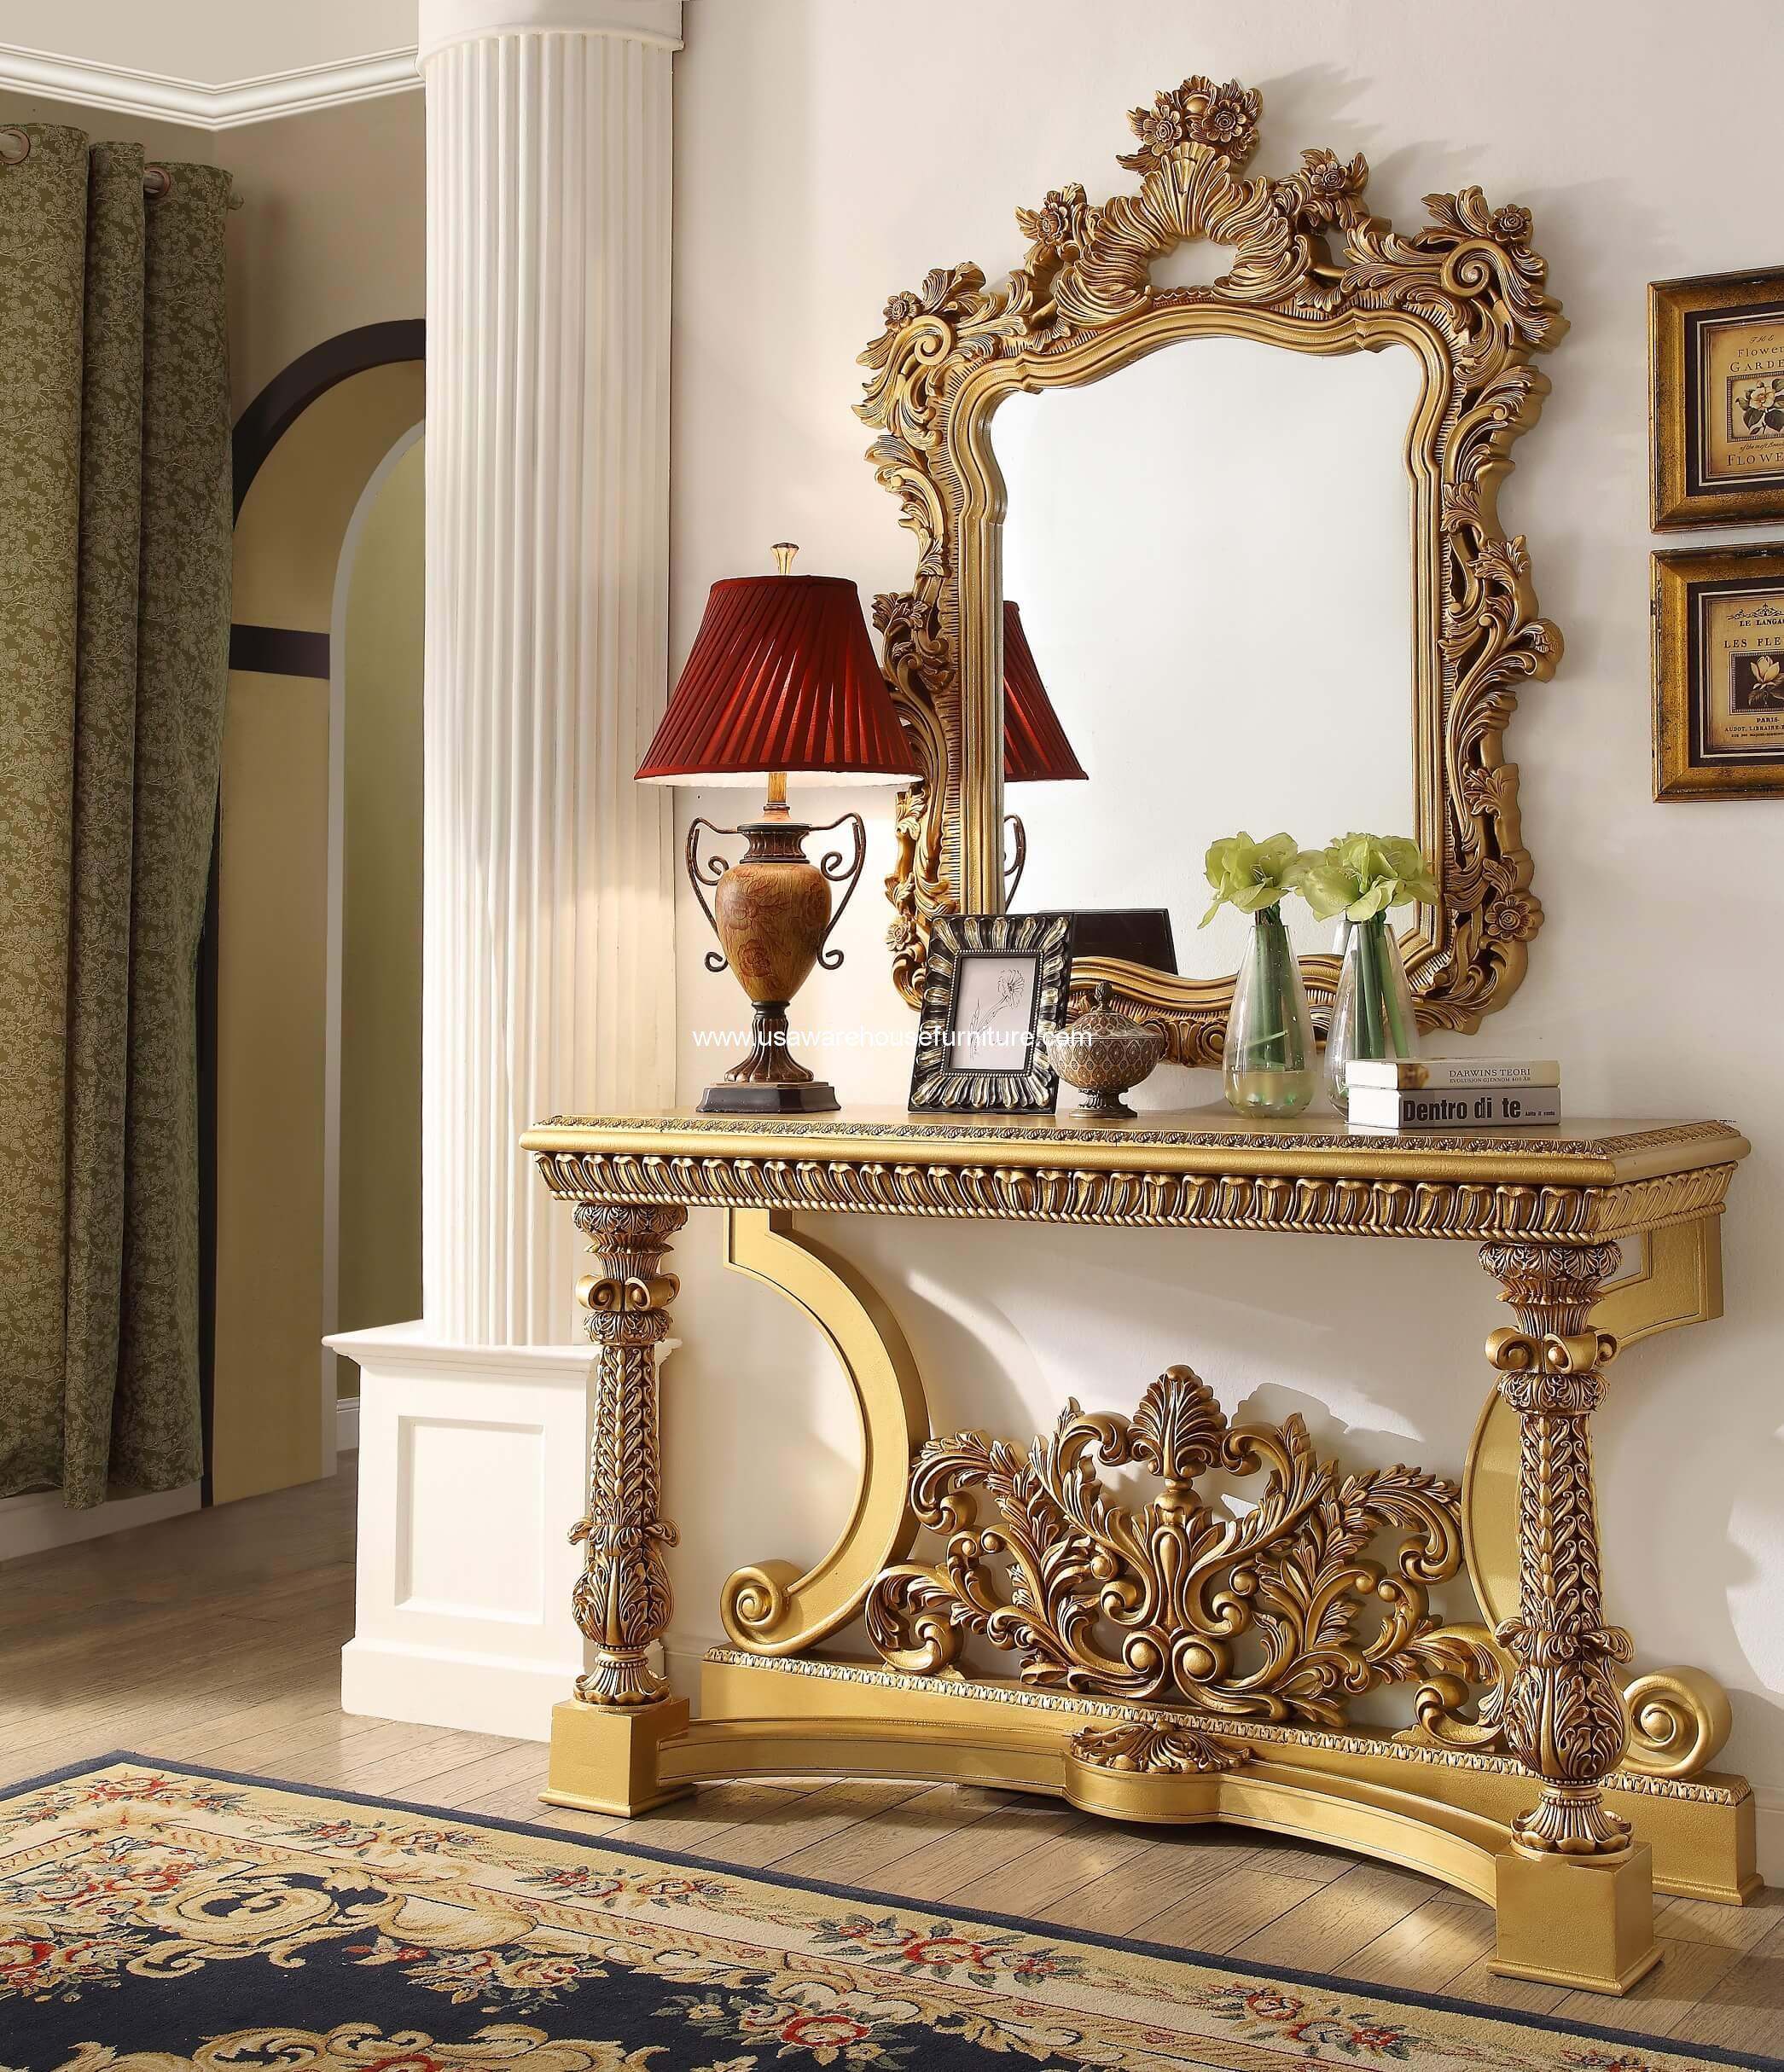 Hd Designs Furniture: Hillsborough Console Table Homey Design HD-8016